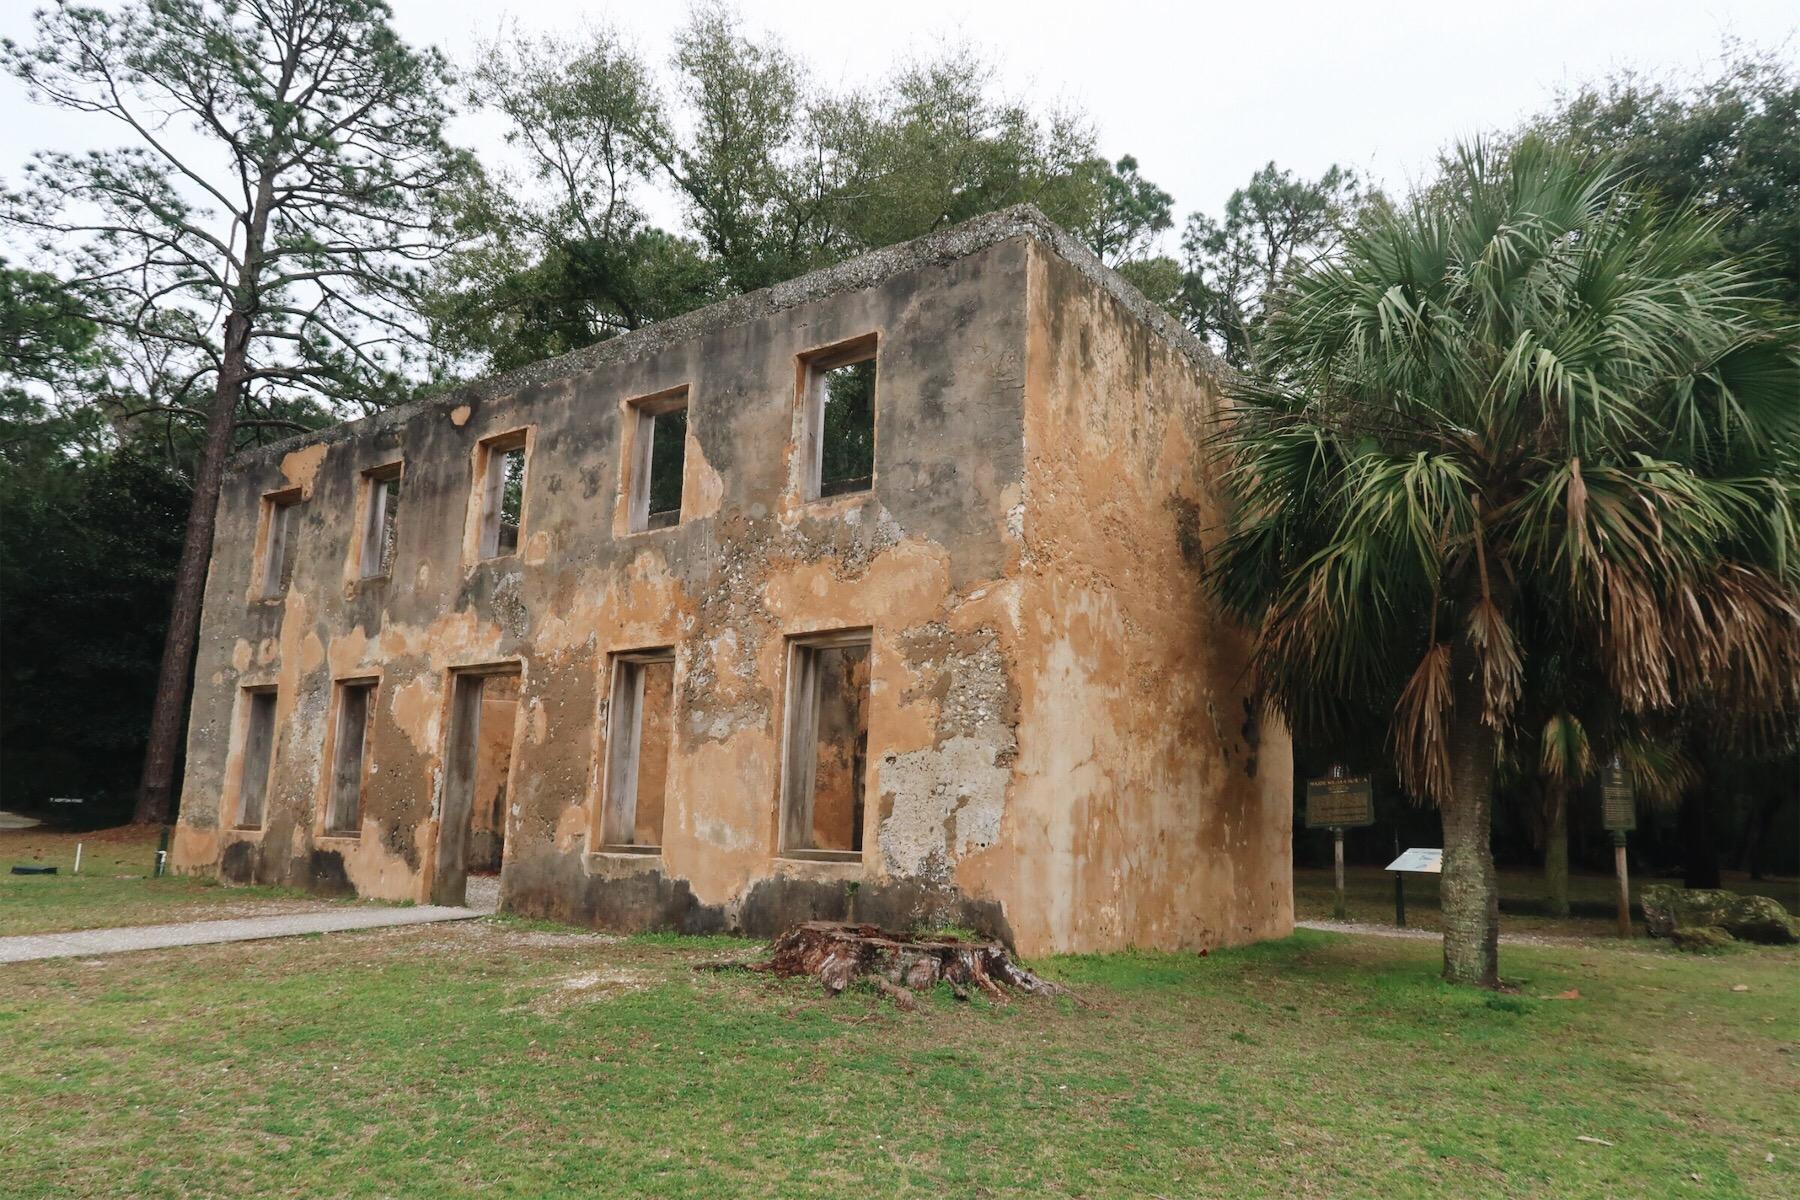 horton-house-jekyll-island-emsontheroad.jpg